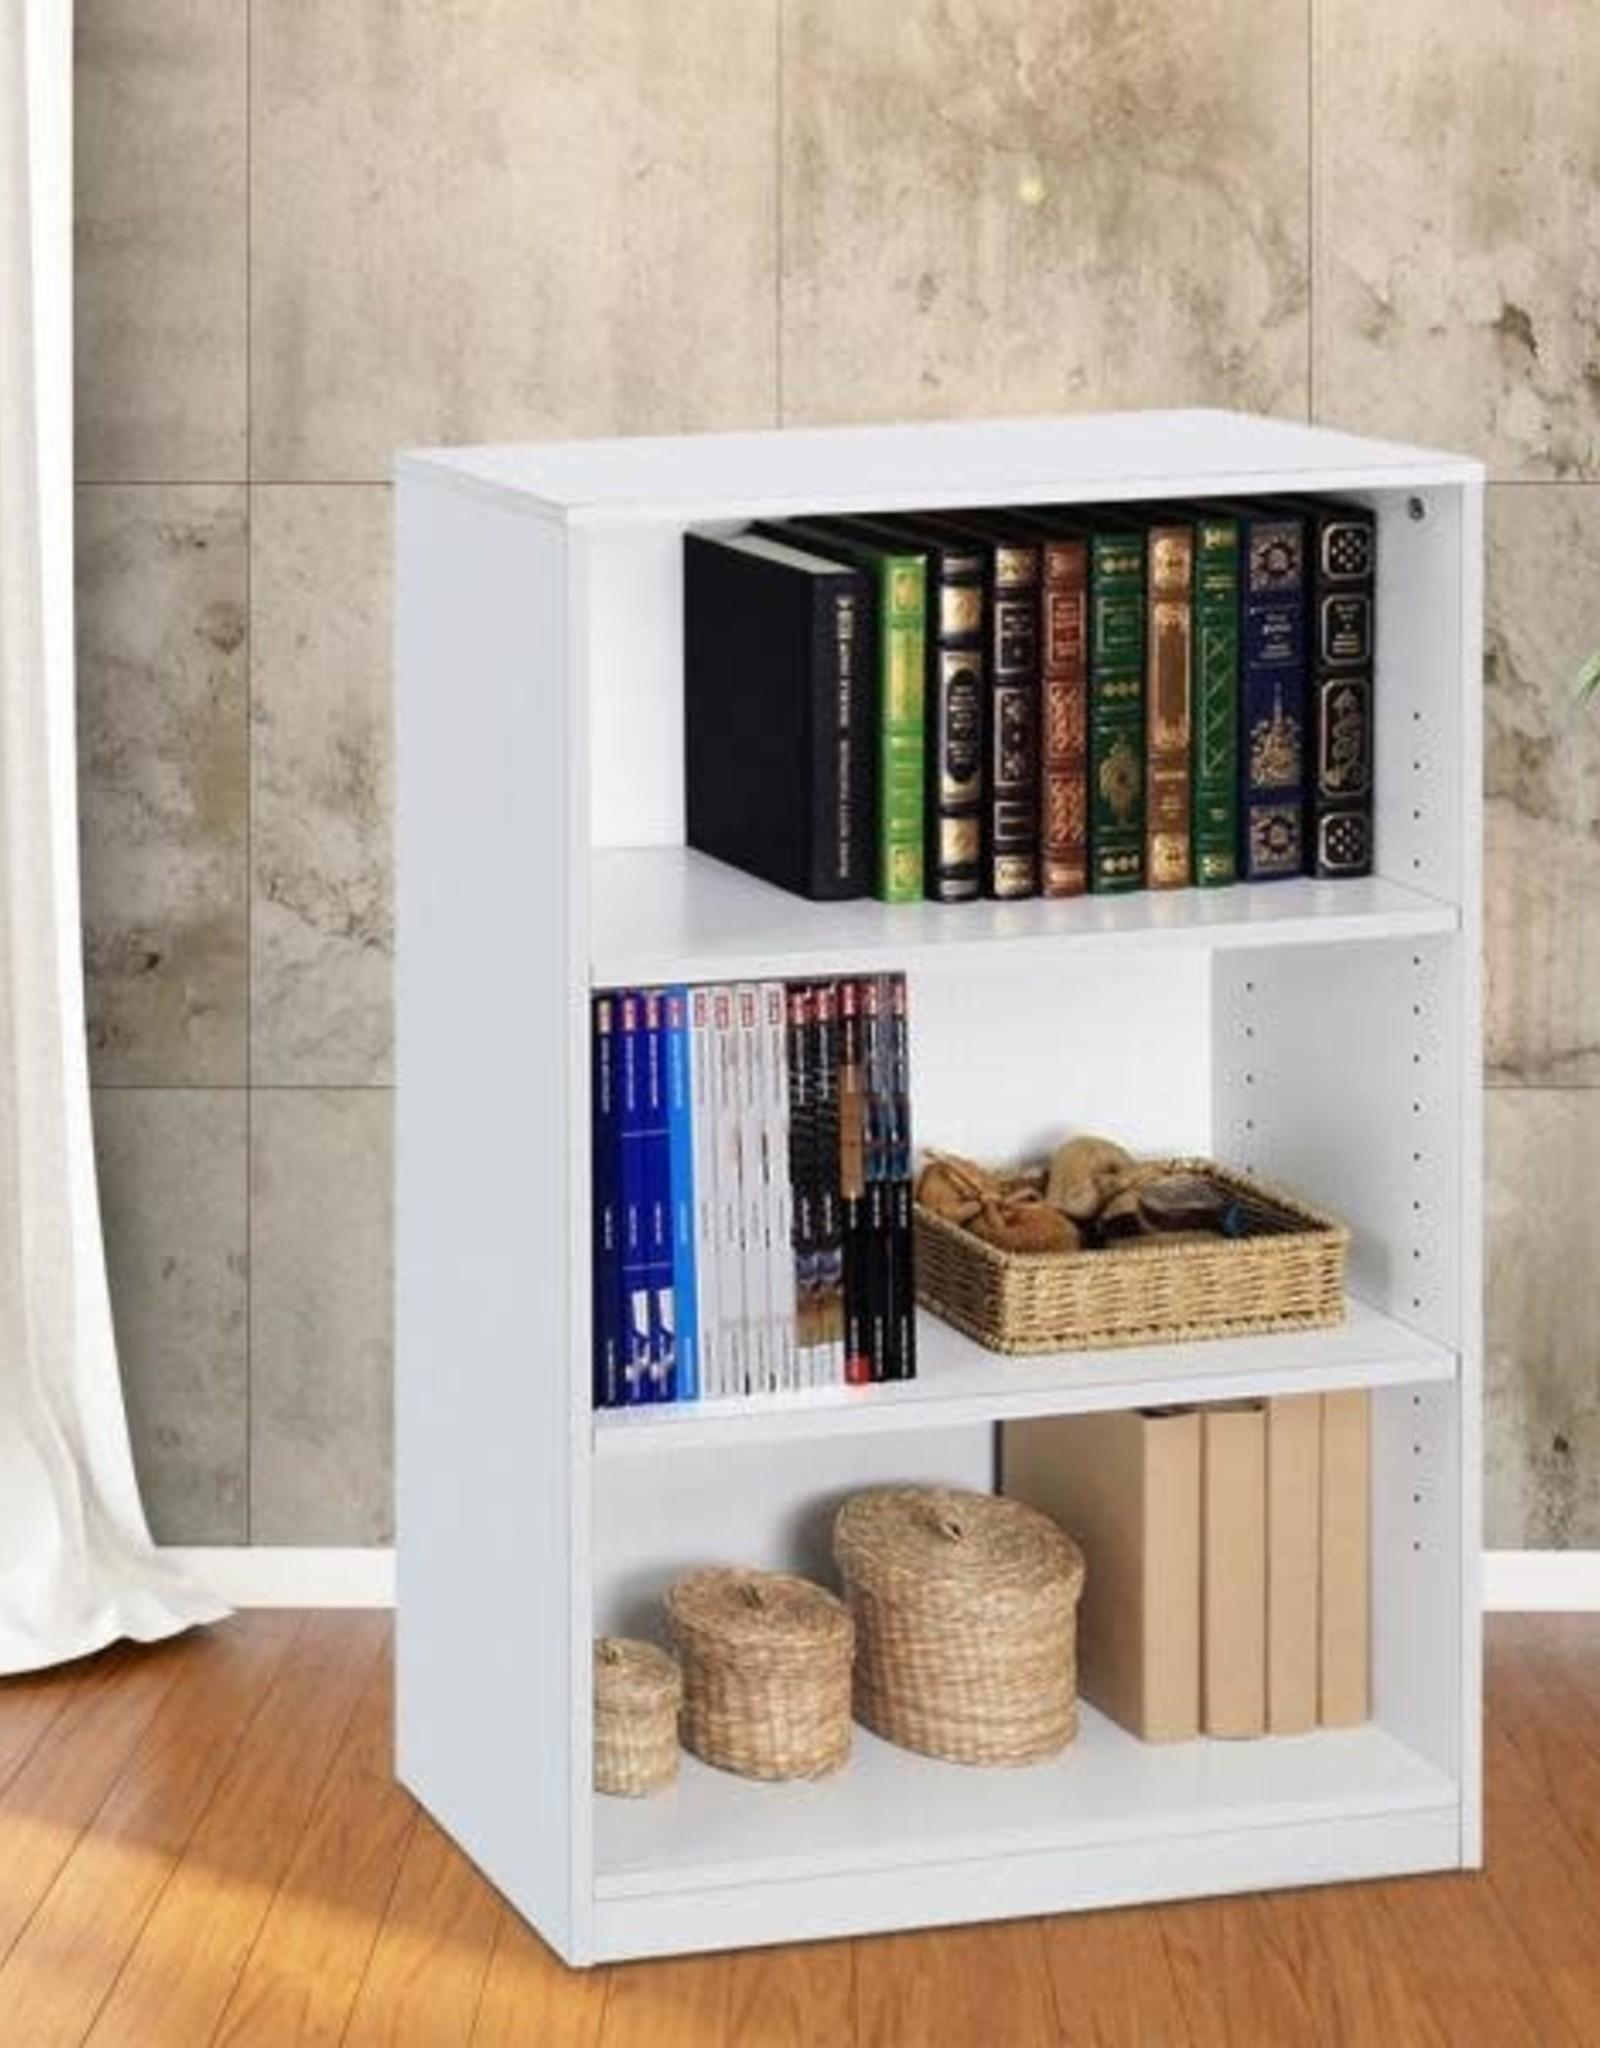 Furrino 40.3 in. White Wood 3-shelf Standard Bookcase with Adjustable Shelves